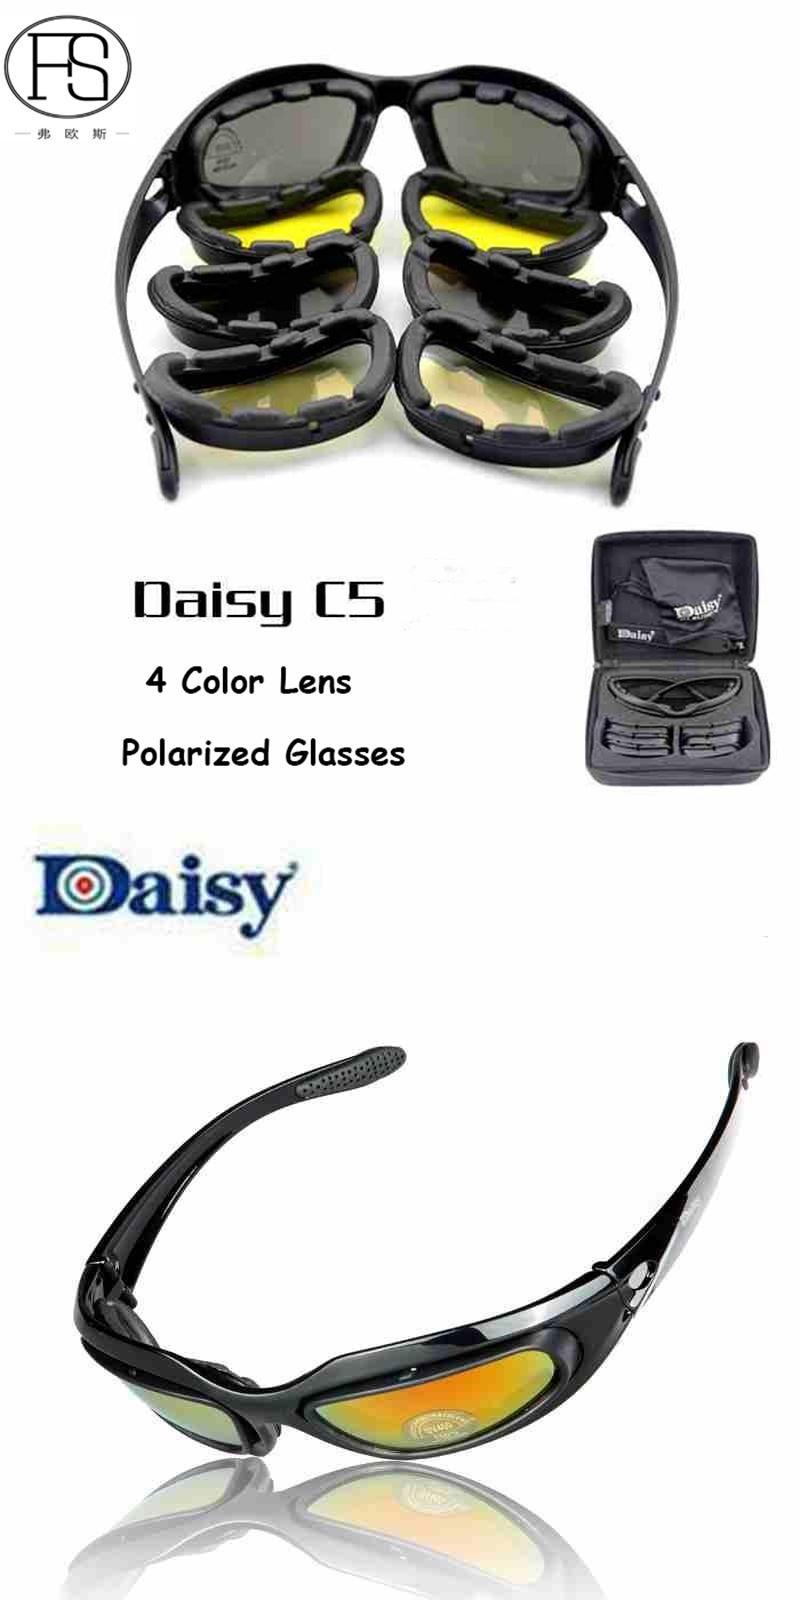 f9c153c0f9da  Visit to Buy  Daisy C5 Cycle Sunglasses 4 Lens Cycling Sports Eyewear  Hunting Military